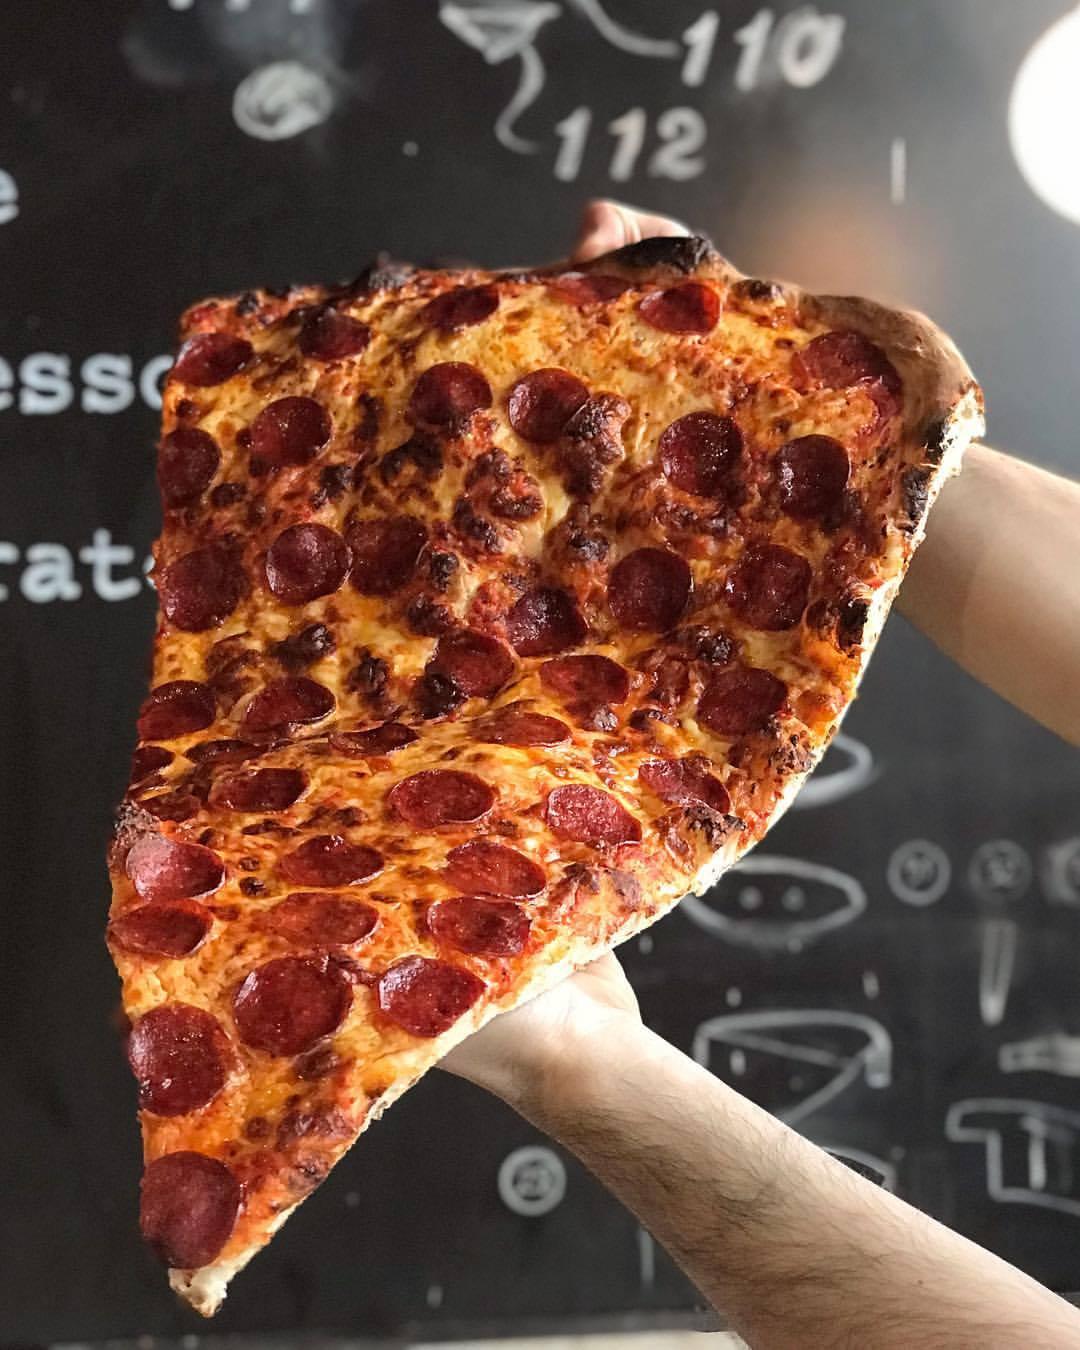 Lamanna's Bakery giant pizza slices